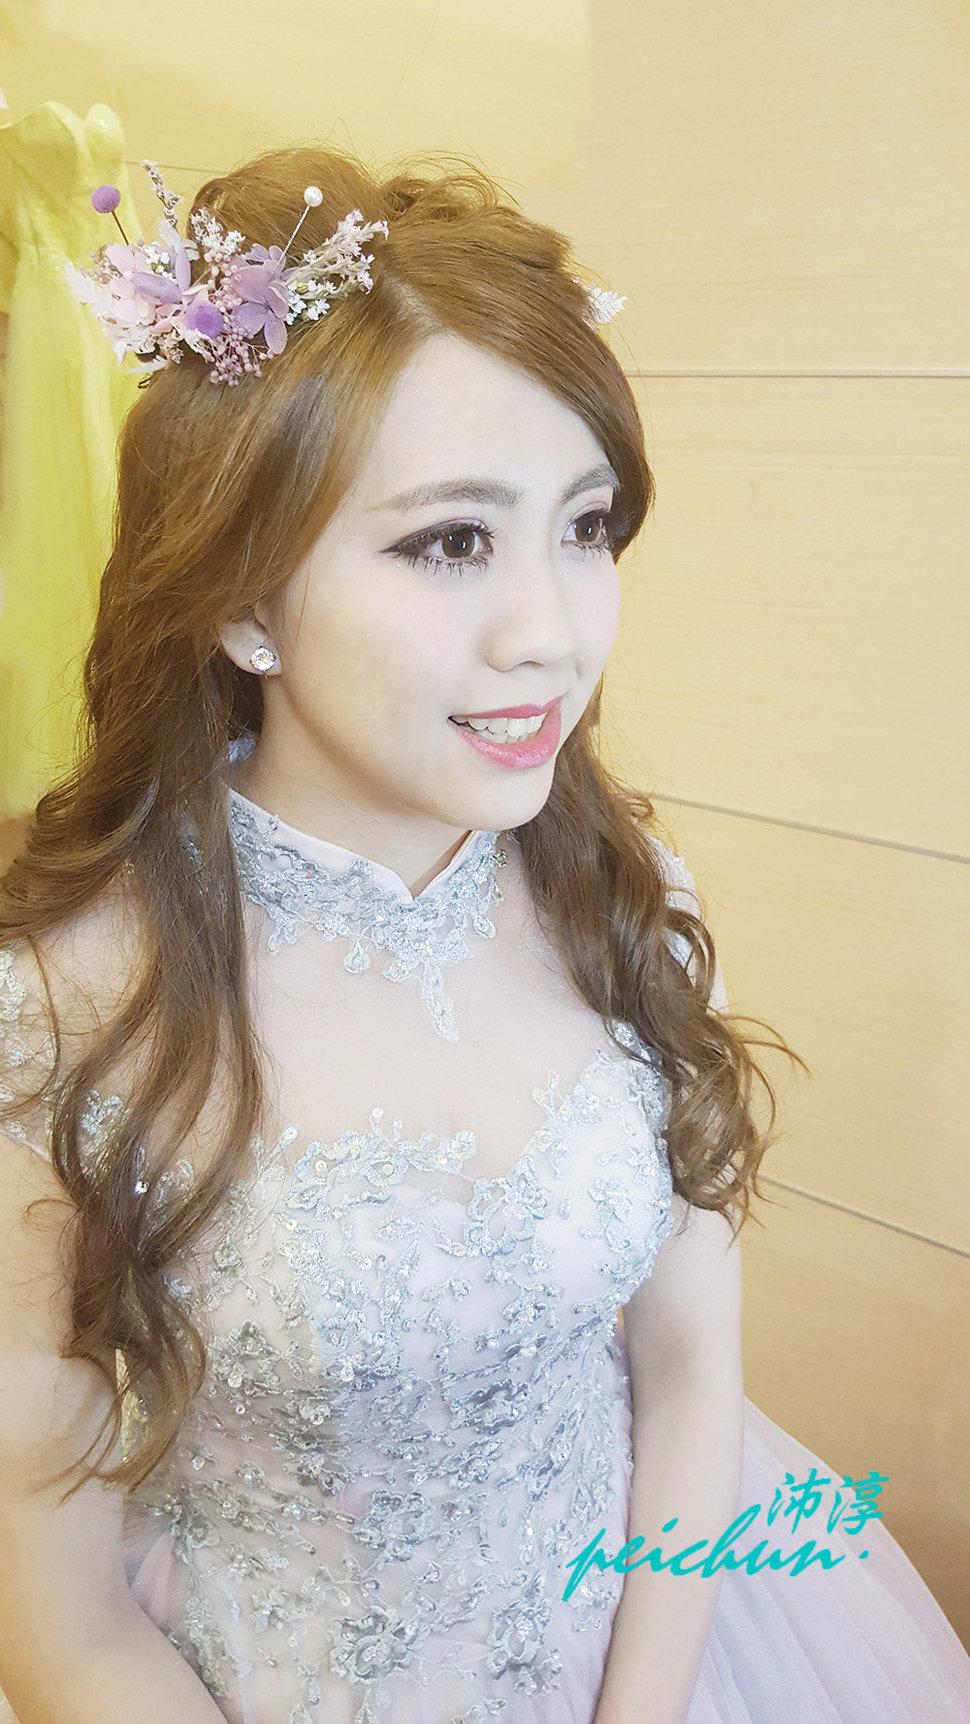 a11 - 新秘沛淳hair & make up - 結婚吧